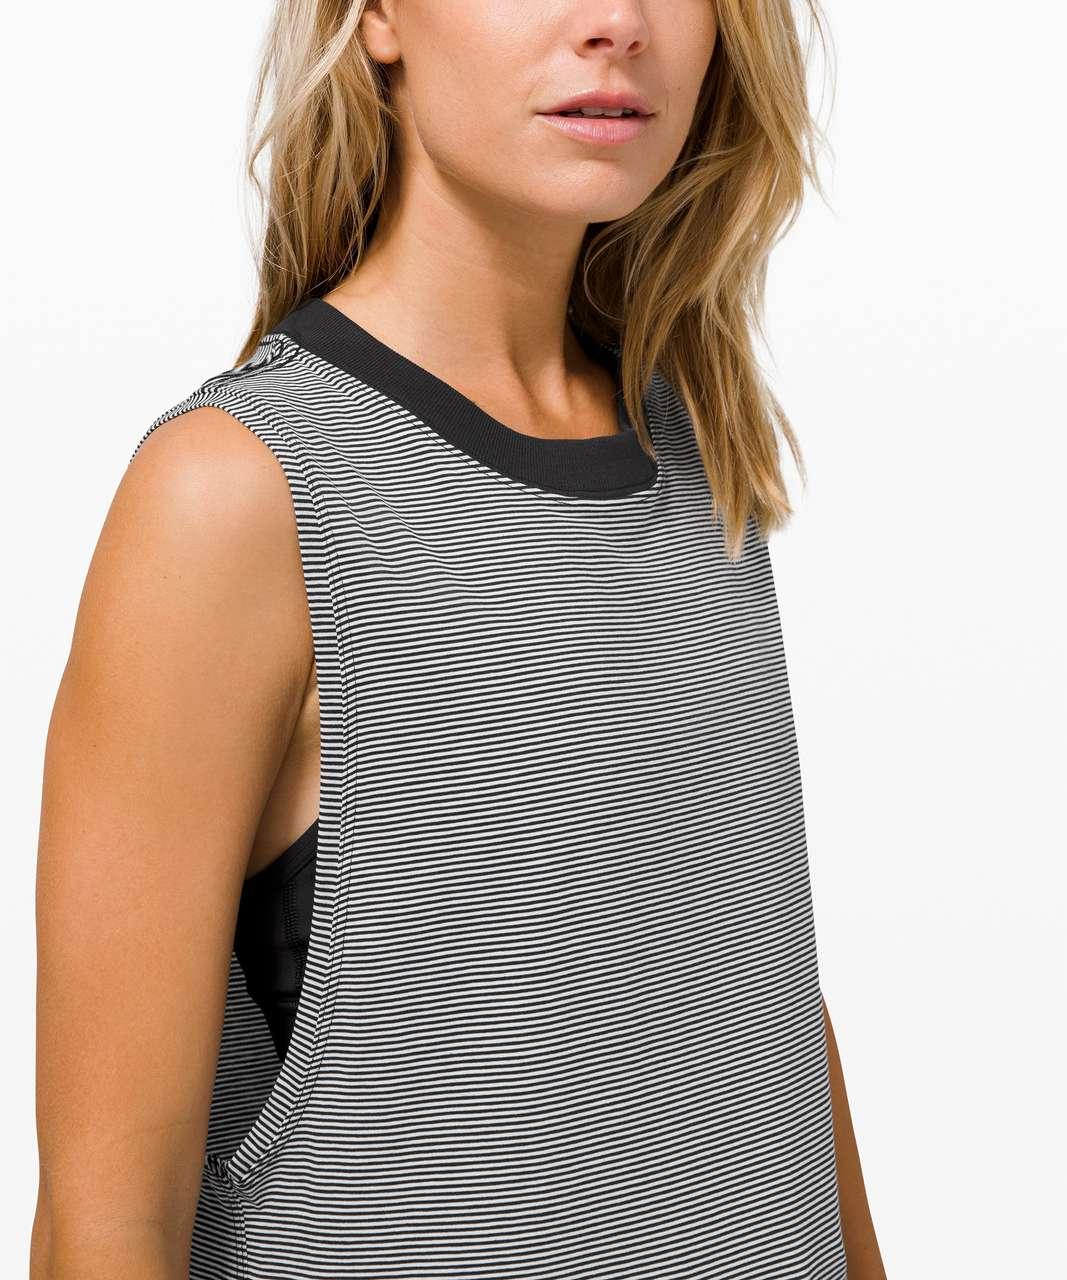 Lululemon All Yours Tank - Tonka Stripe Black White